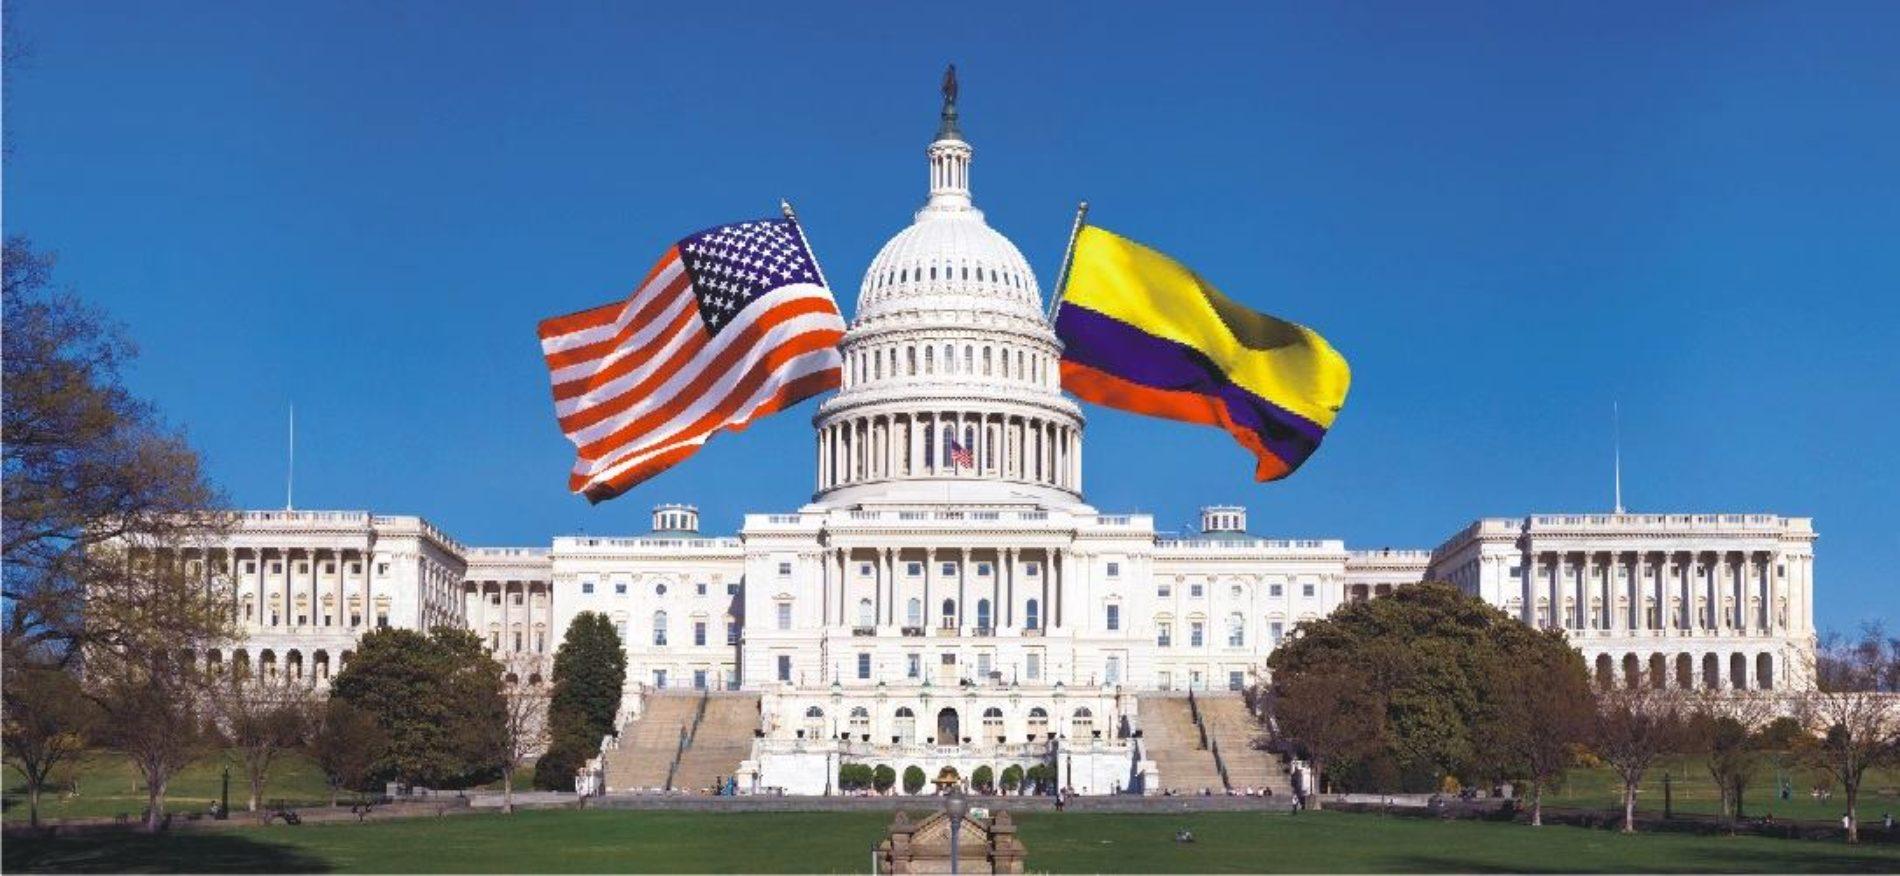 EXPOFERIA DE LAS AMÉRICAS EN WASHINGTON D.C.